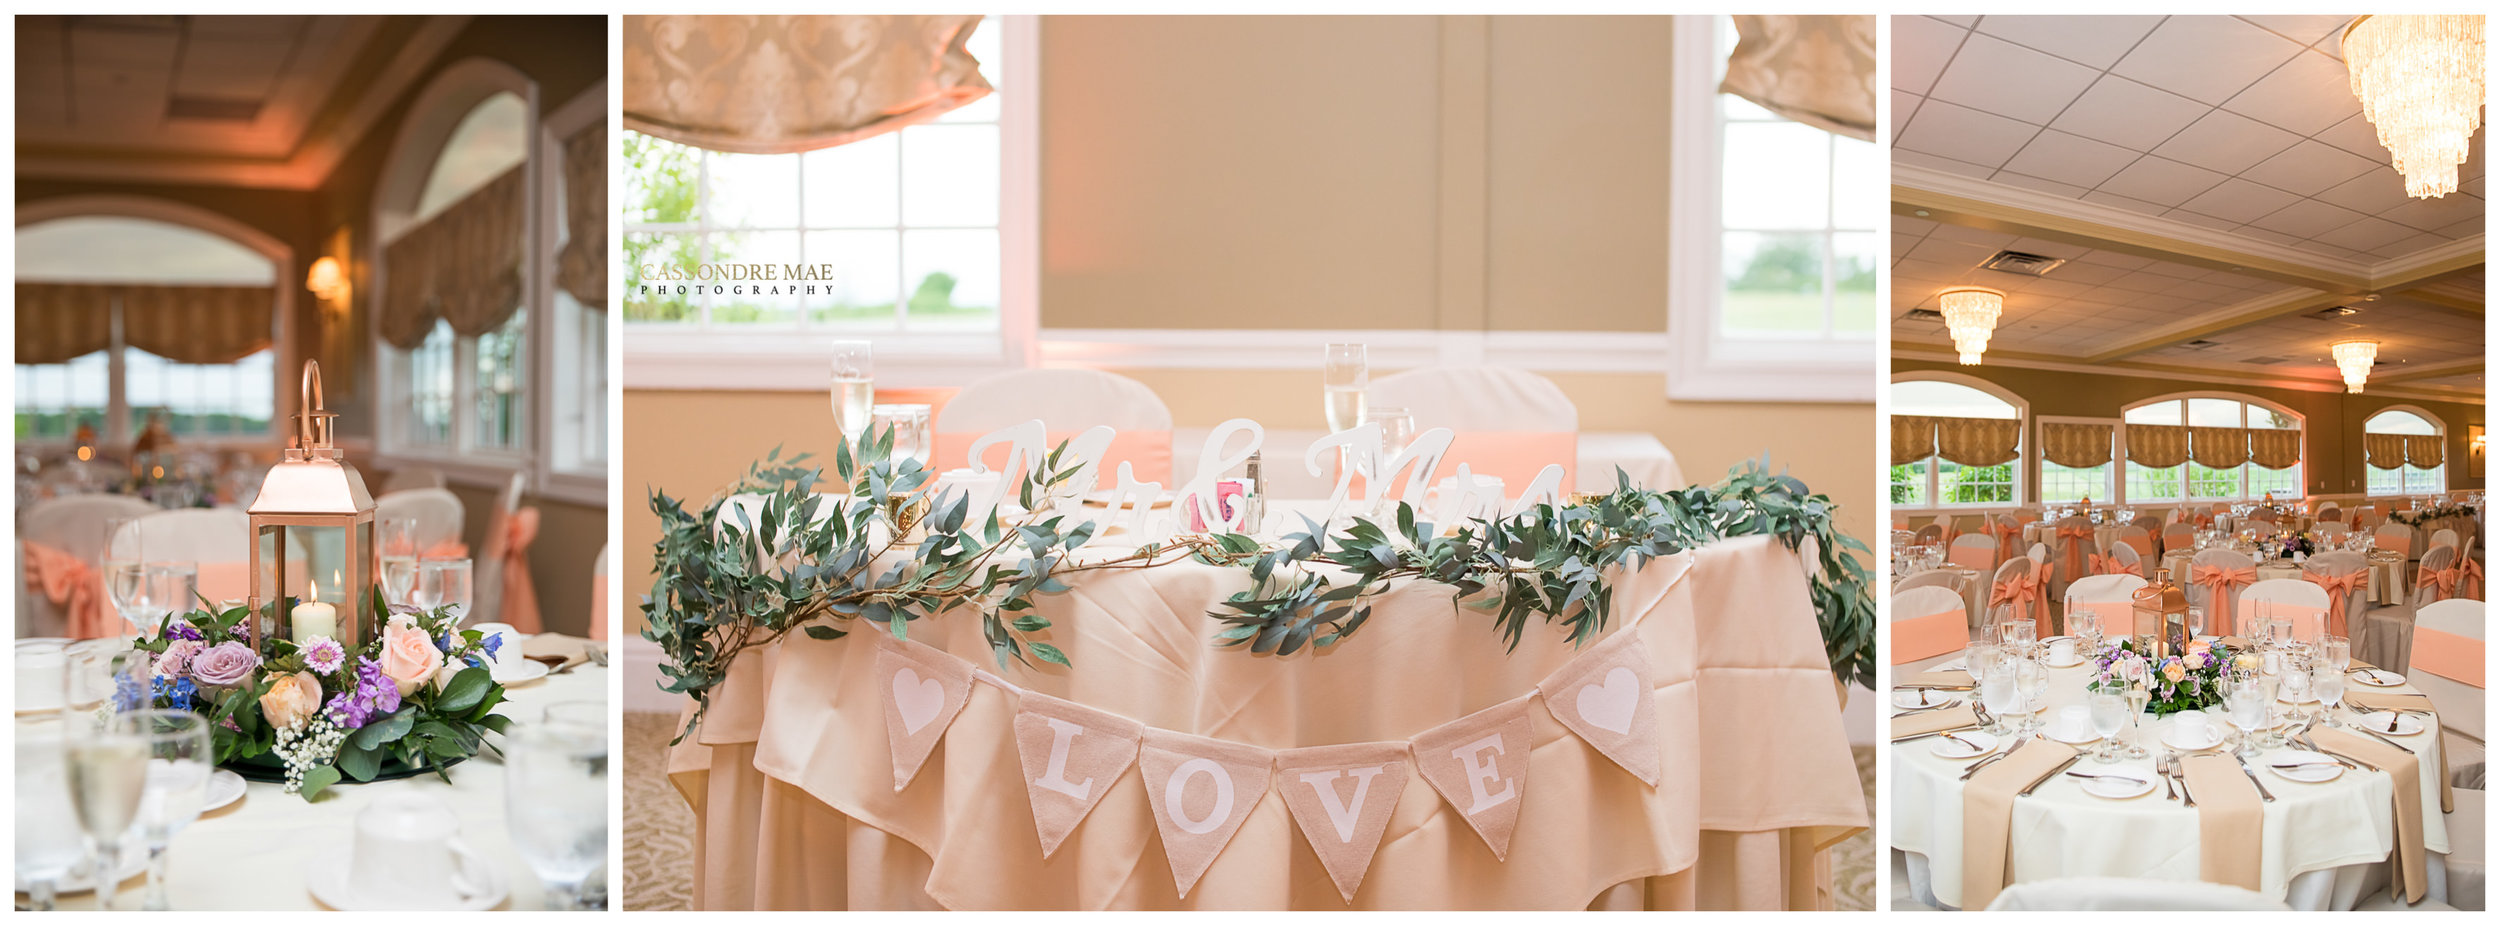 Cassondre Mae Photography Links at Unionvale Wedding 19.jpg